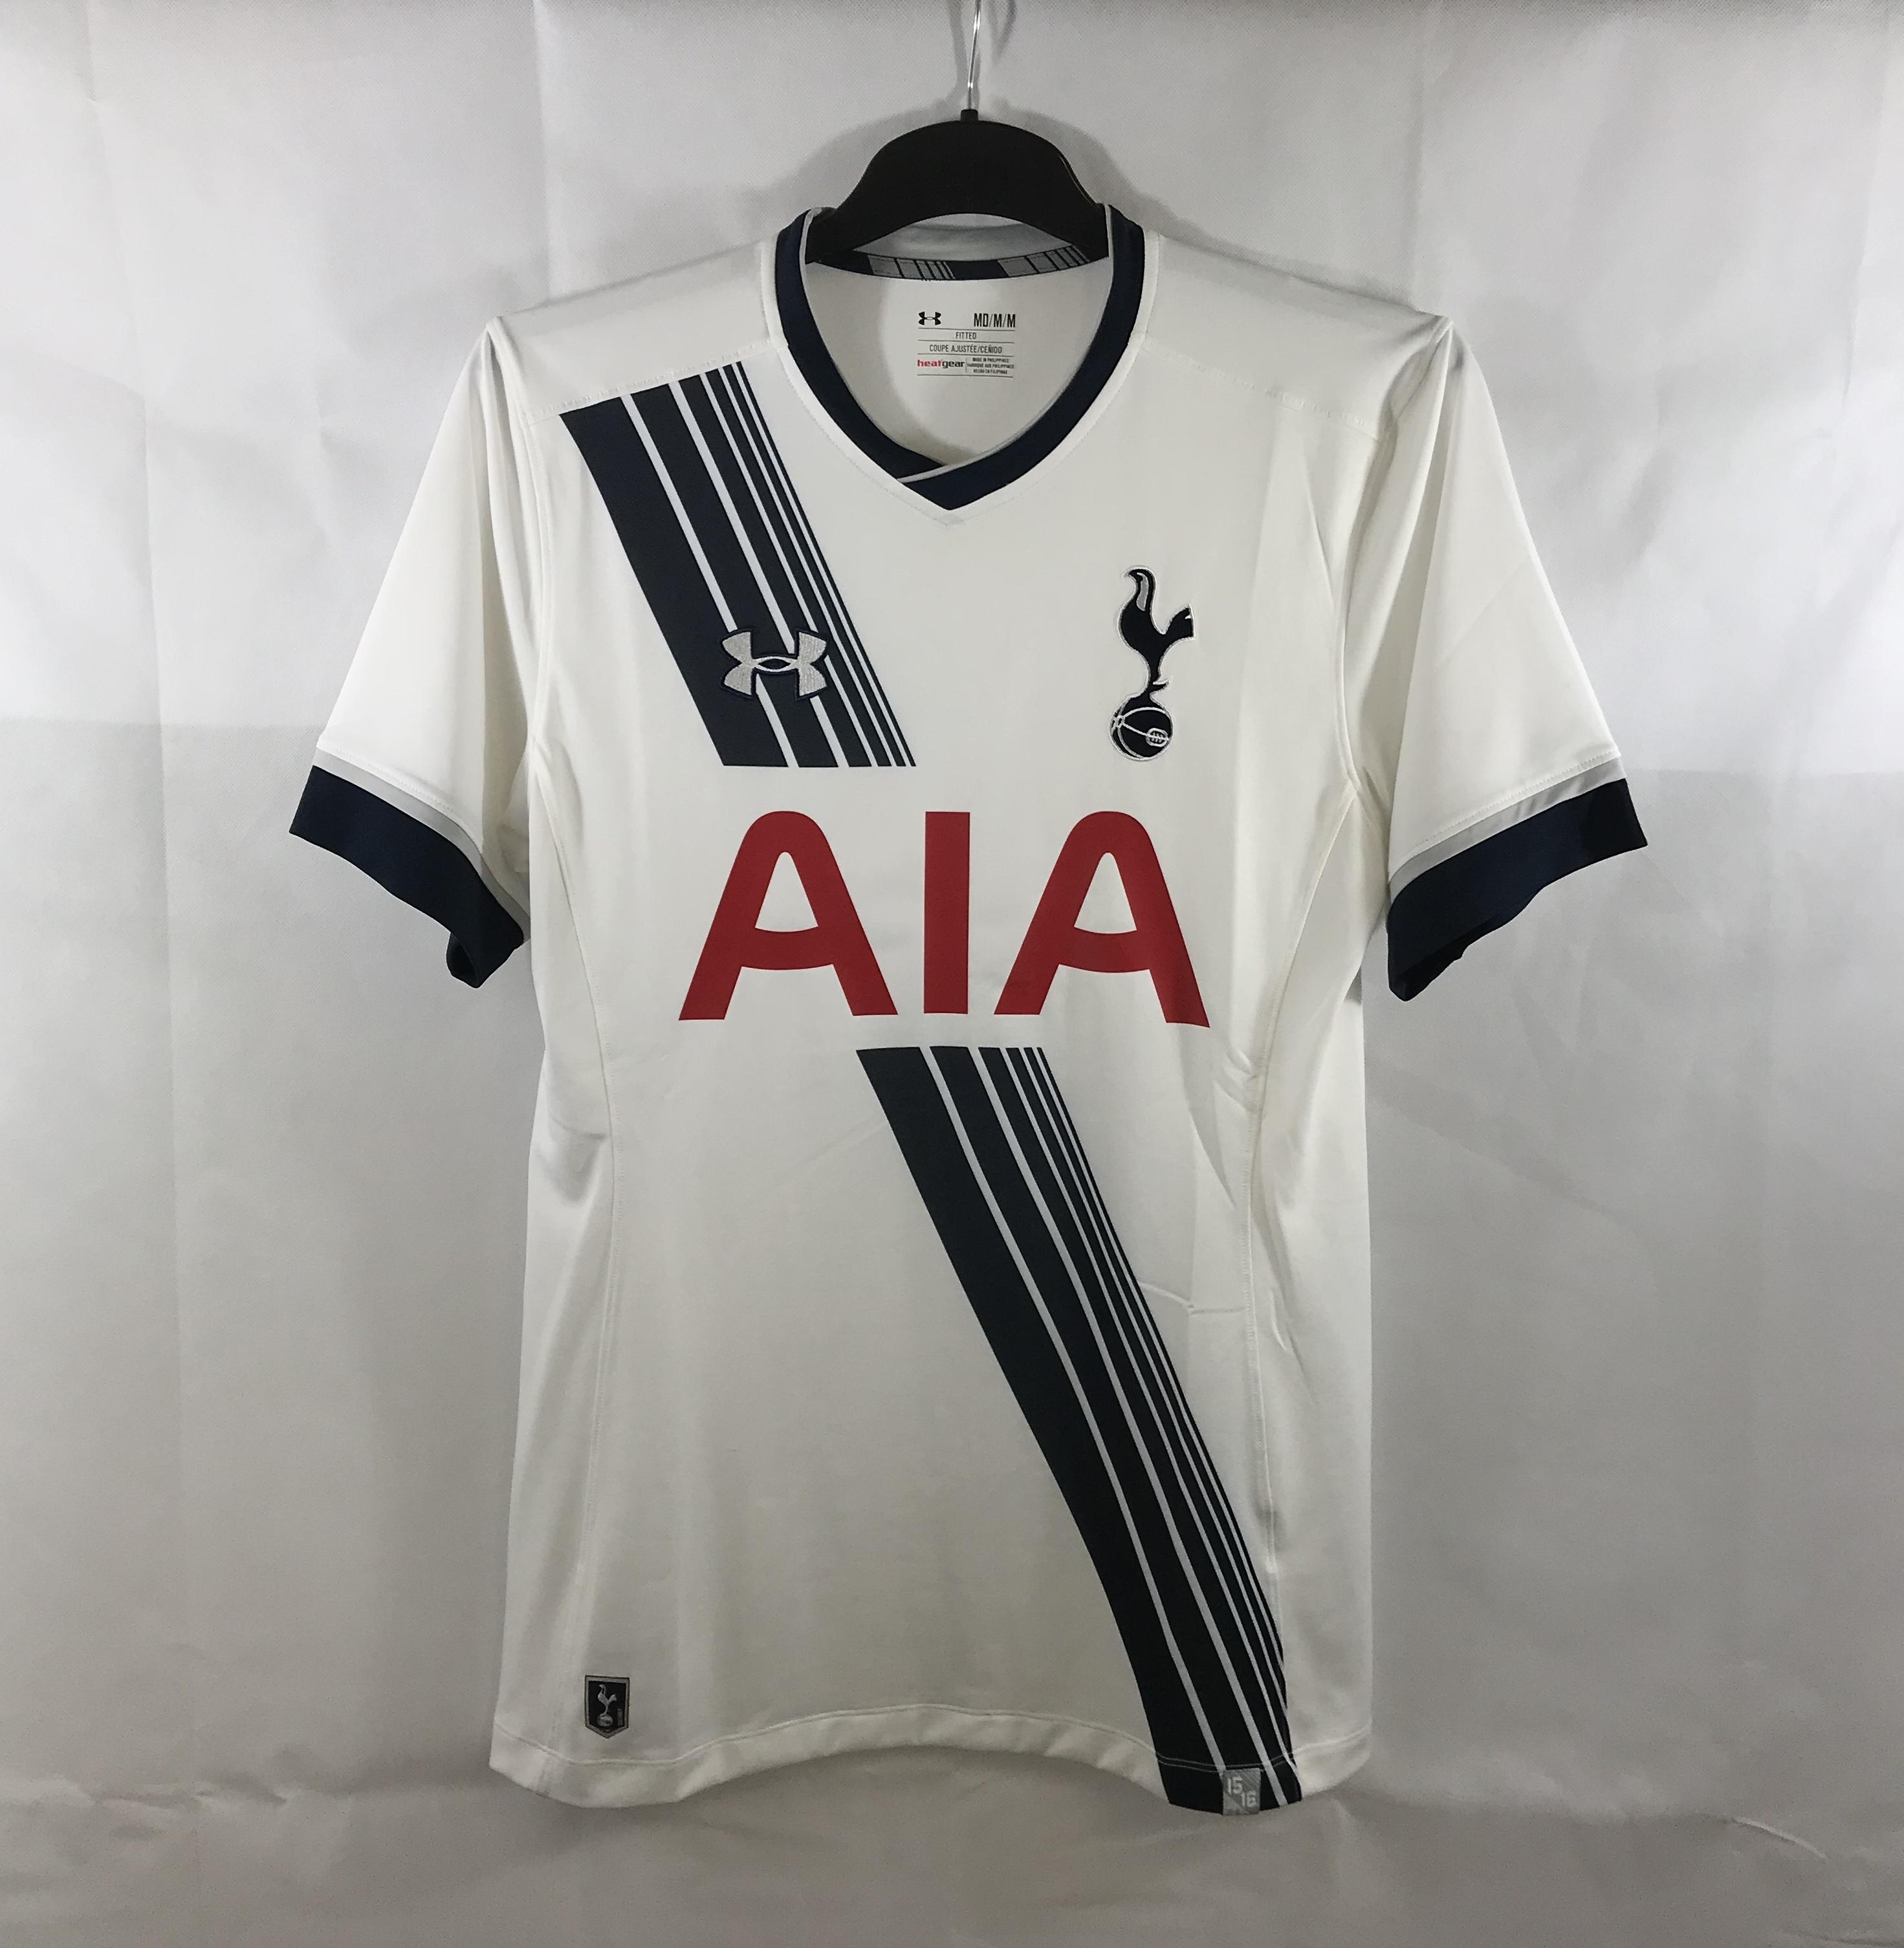 ec0537bf Tottenham Hotspur Home Football Shirt 2015/16 Adults Medium Under Armour.  🔍. instock